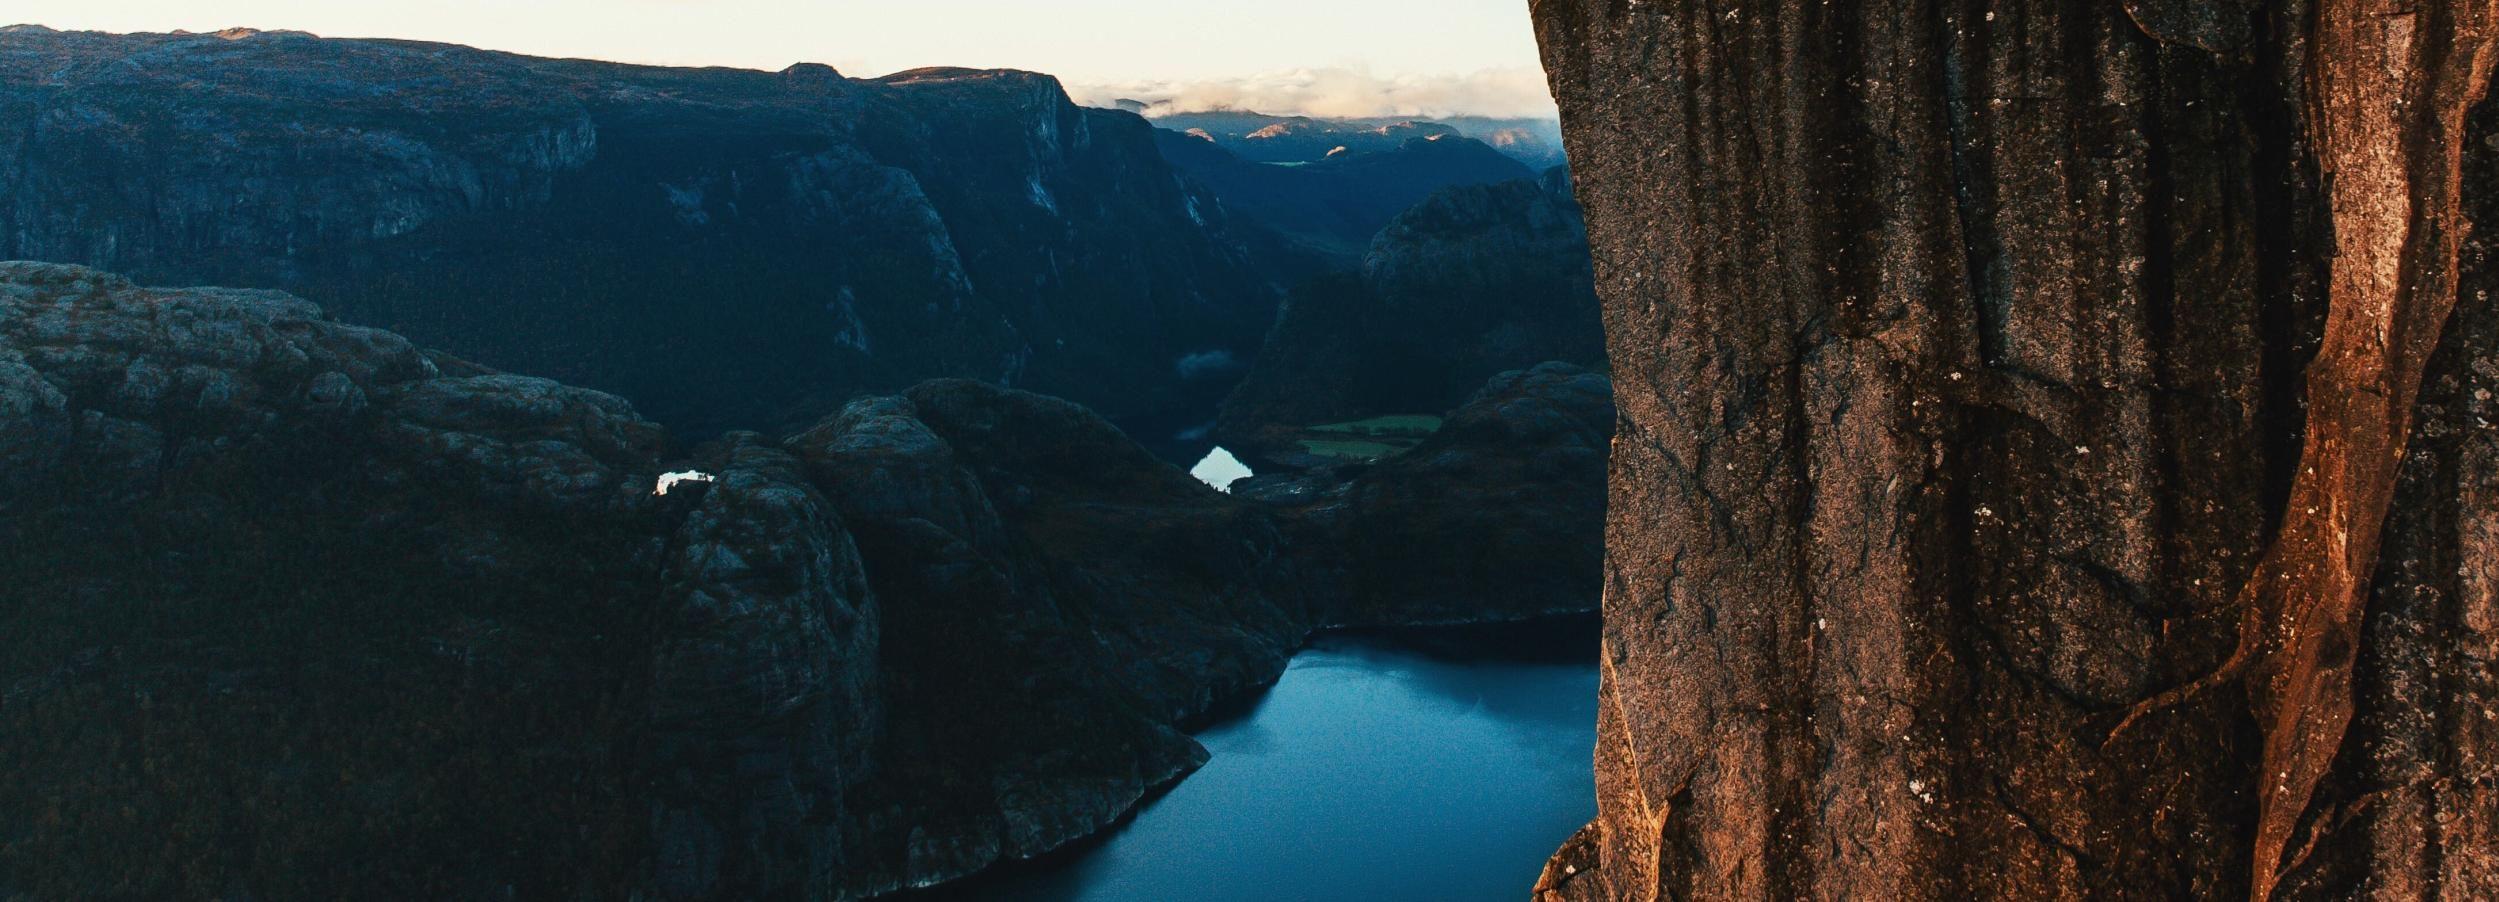 From Stavanger: Preikestolen (Pulpit Rock) Guided Hike